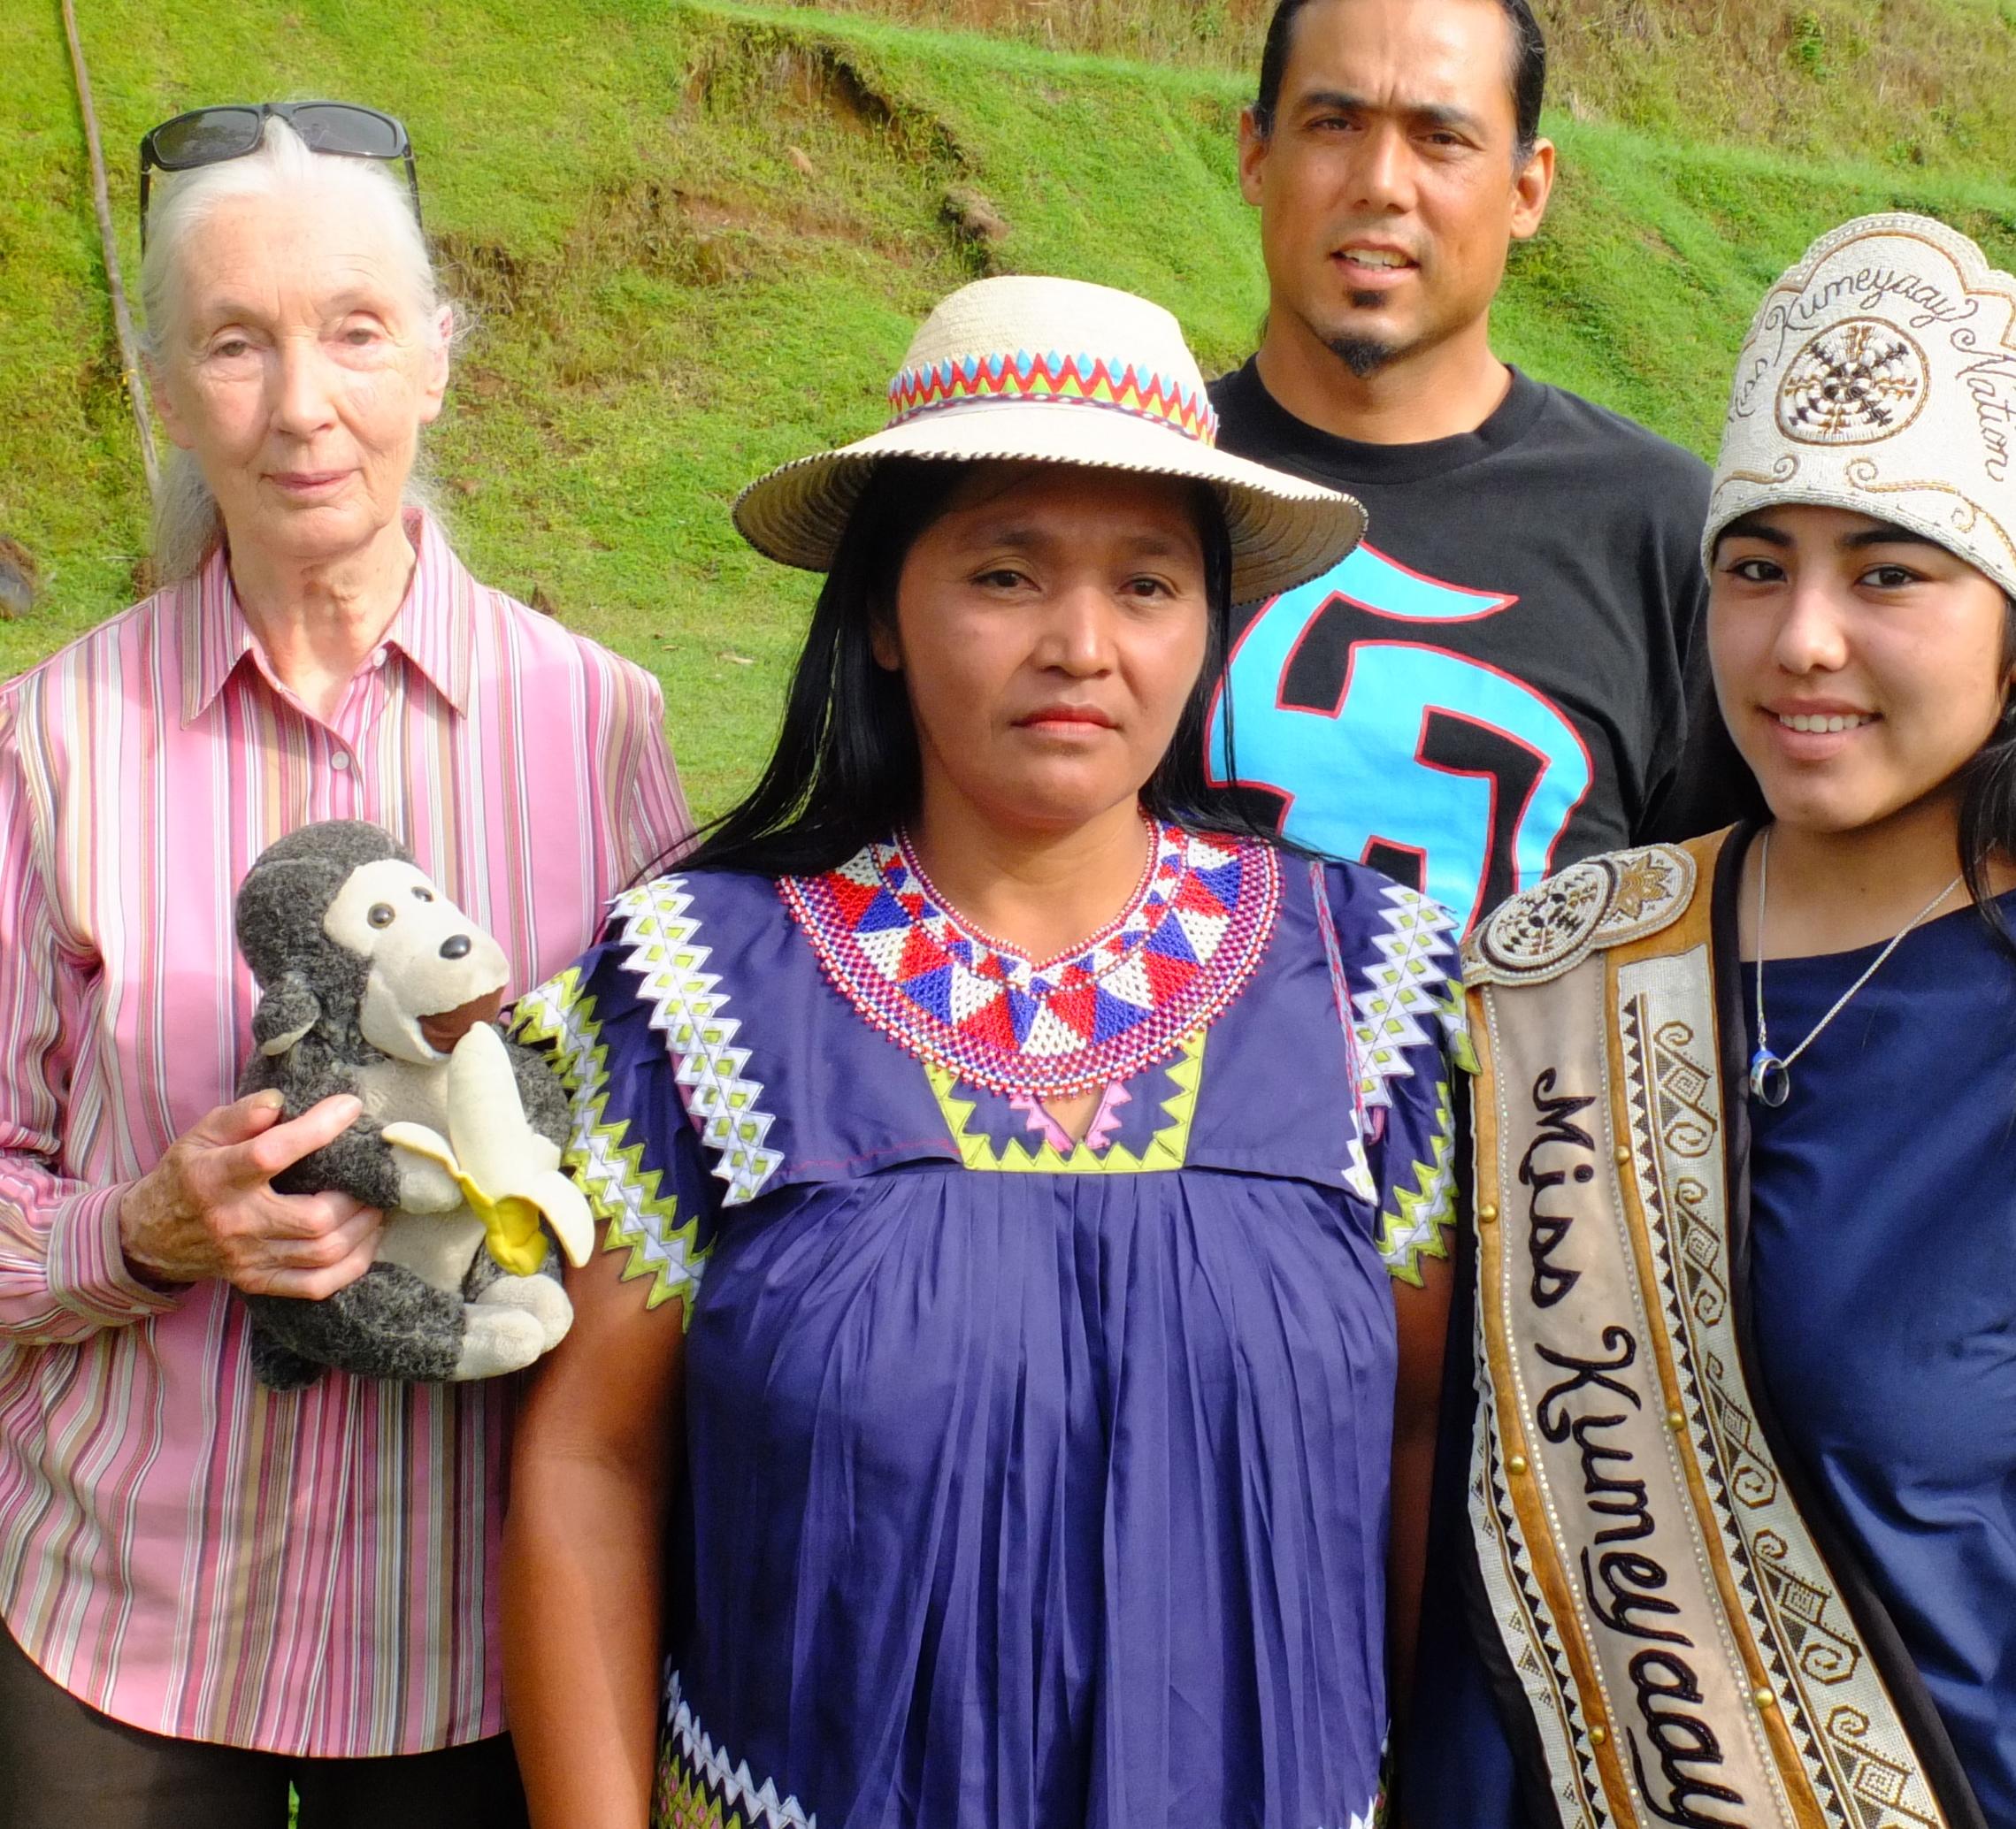 Dr. Jane Goodall, Cheif Silvia, Miss Kumeyaay, ITY @ Center for Biocultural Leadership, Panama.